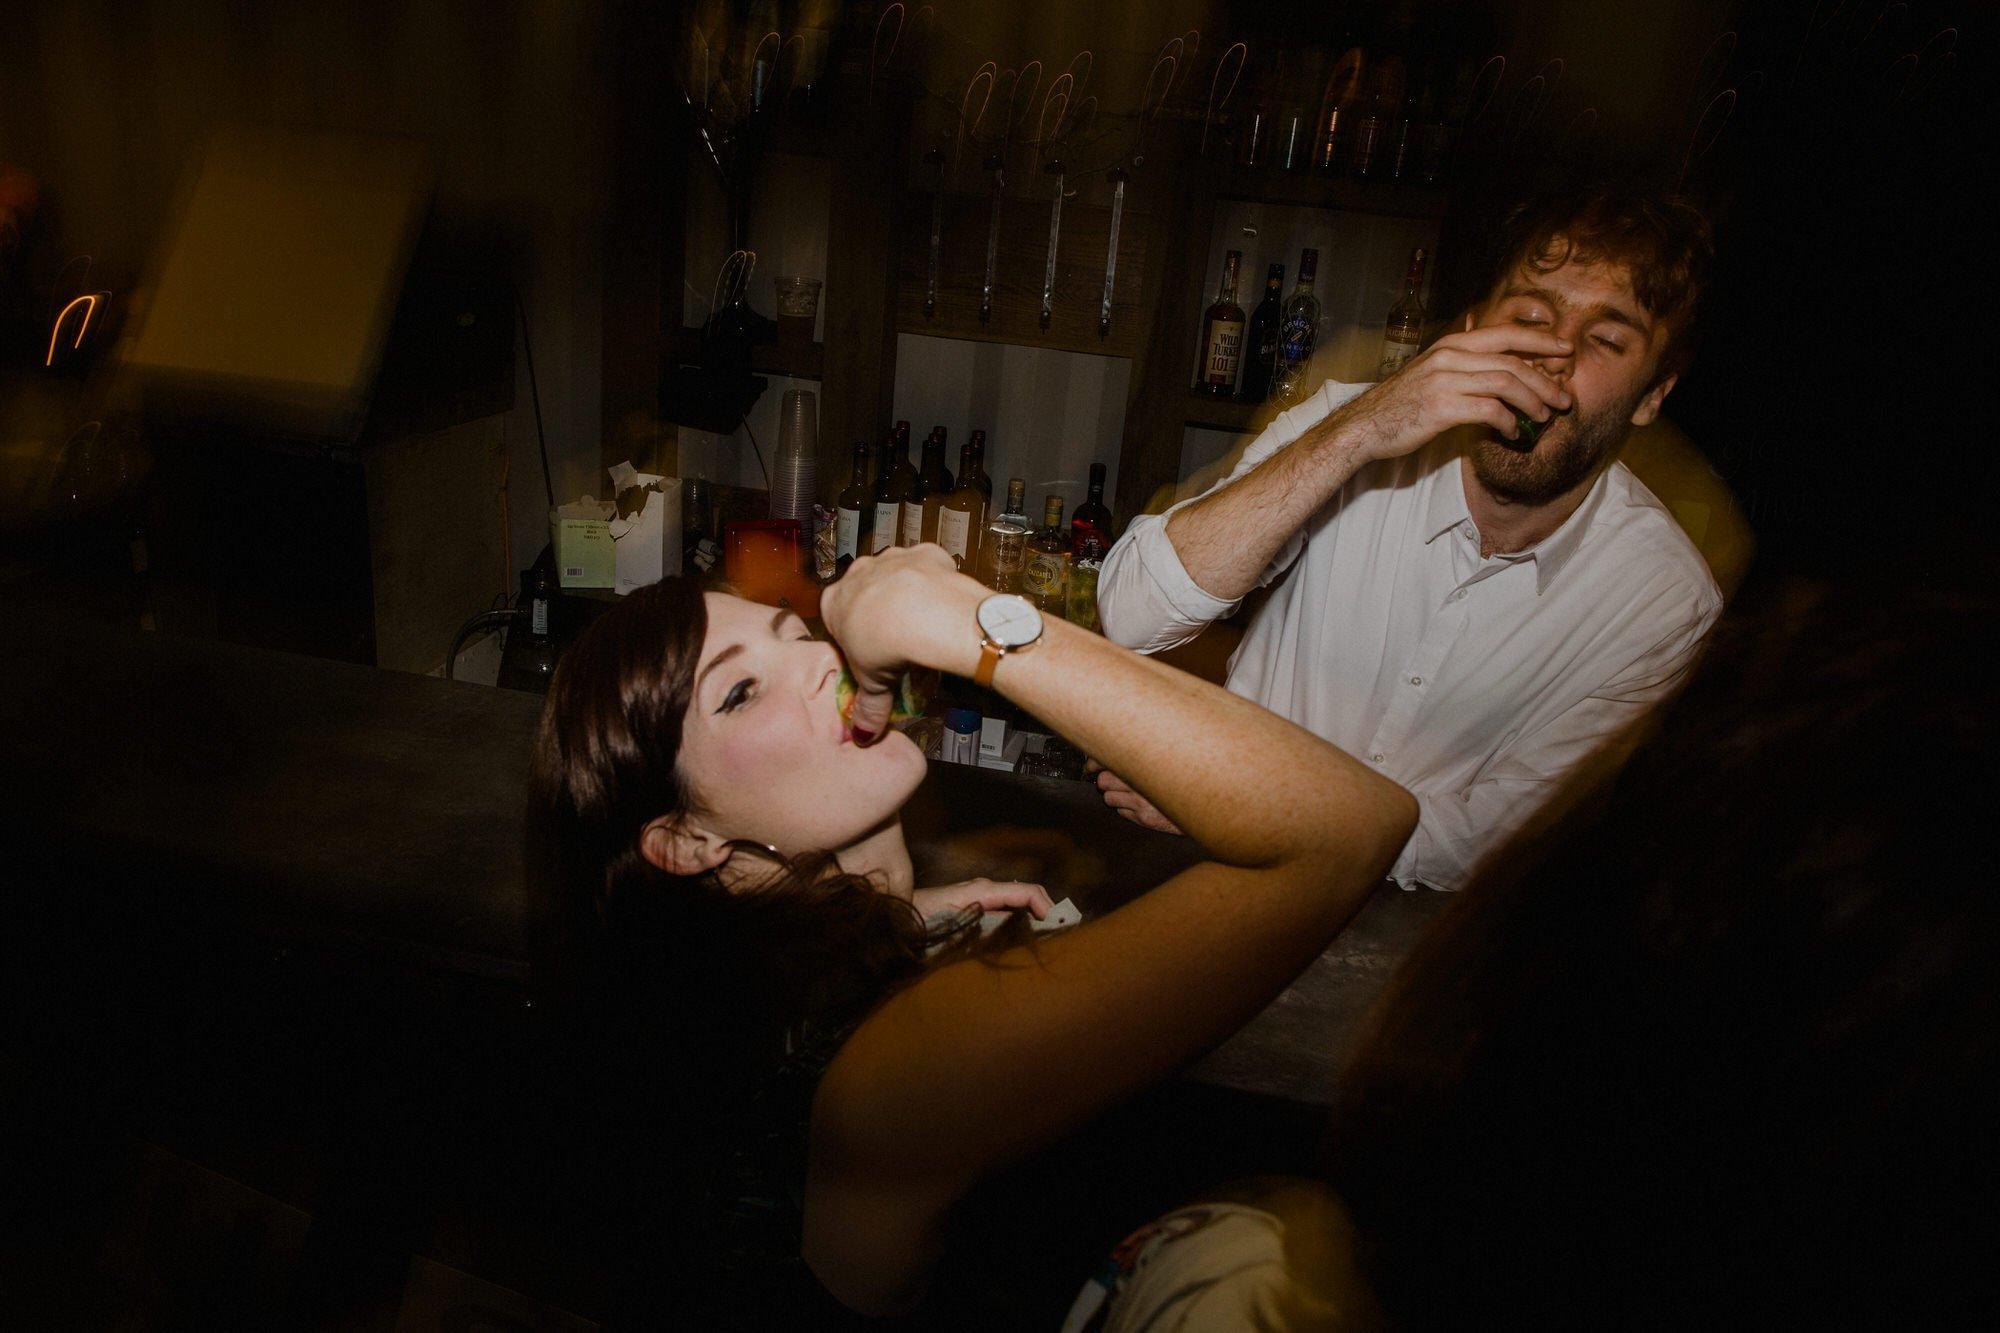 081 TIN SHED KNOCKRAICH FARM WEDDING ALTERNATIVE BRIDE ZOE ALEXANDRA PHOTOGRAPHY